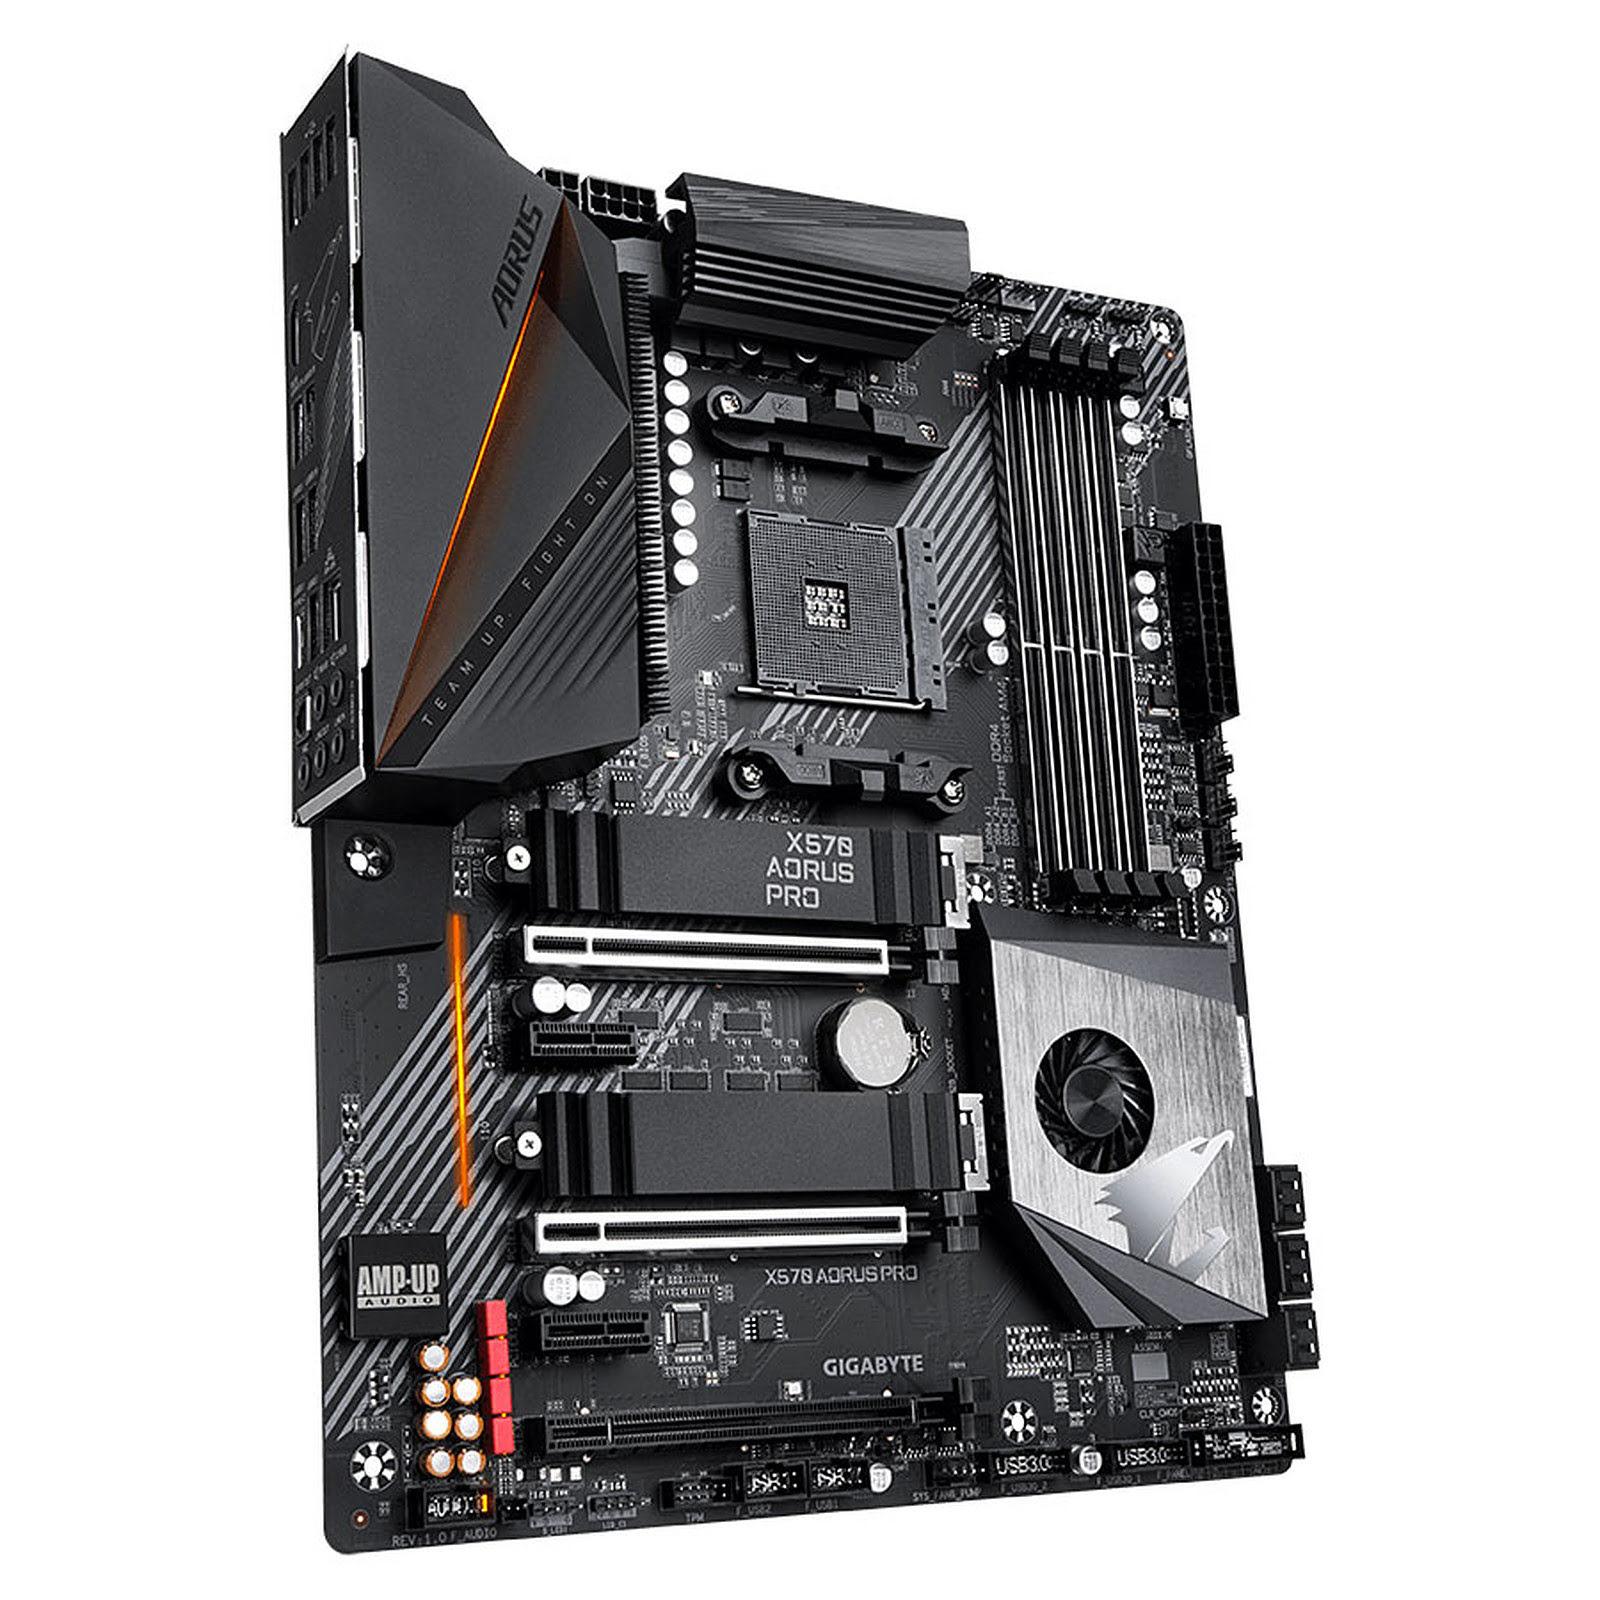 Gigabyte X570 AORUS PRO ATX DDR4 - Carte mère Gigabyte - 4